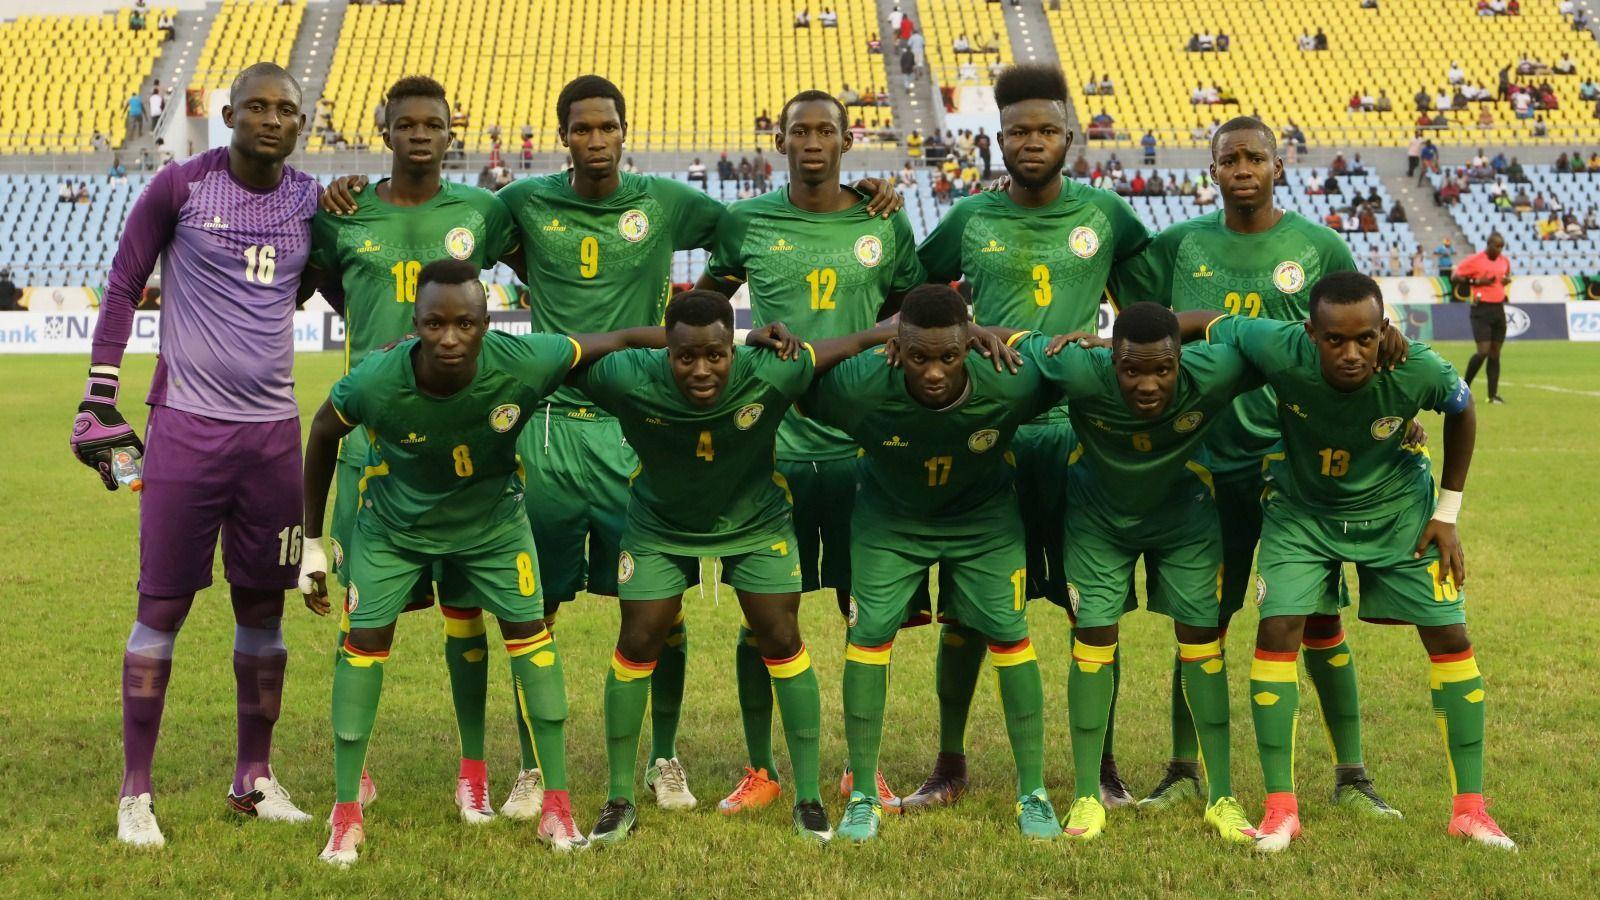 Senegal National Football Team Teams Backgrounds 4